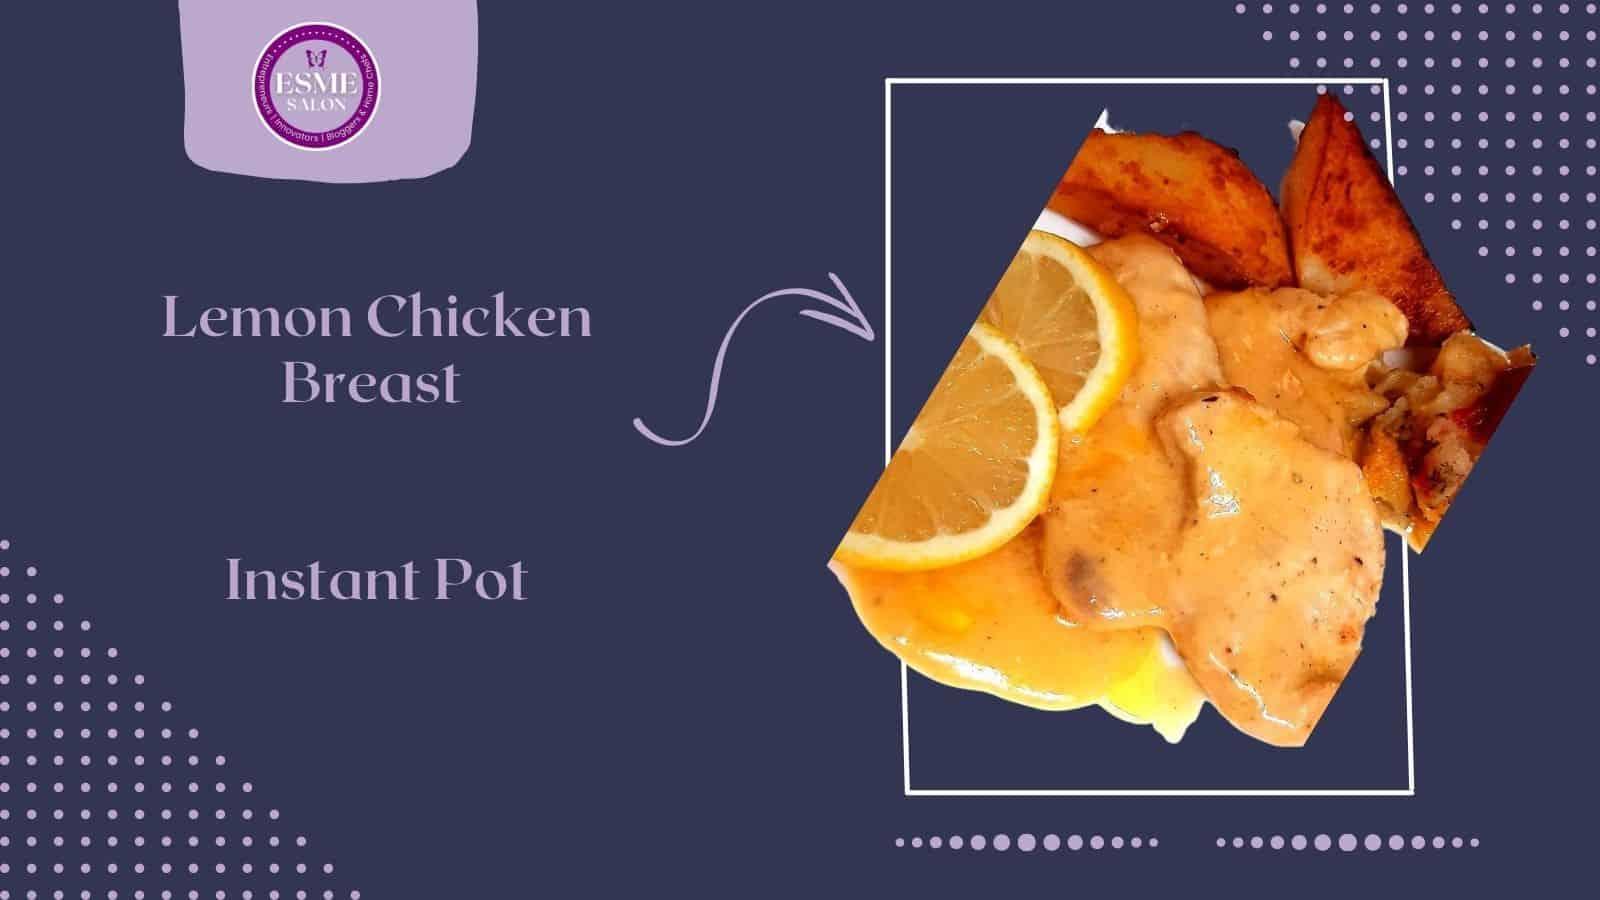 Lemon chicken with potato and sauce